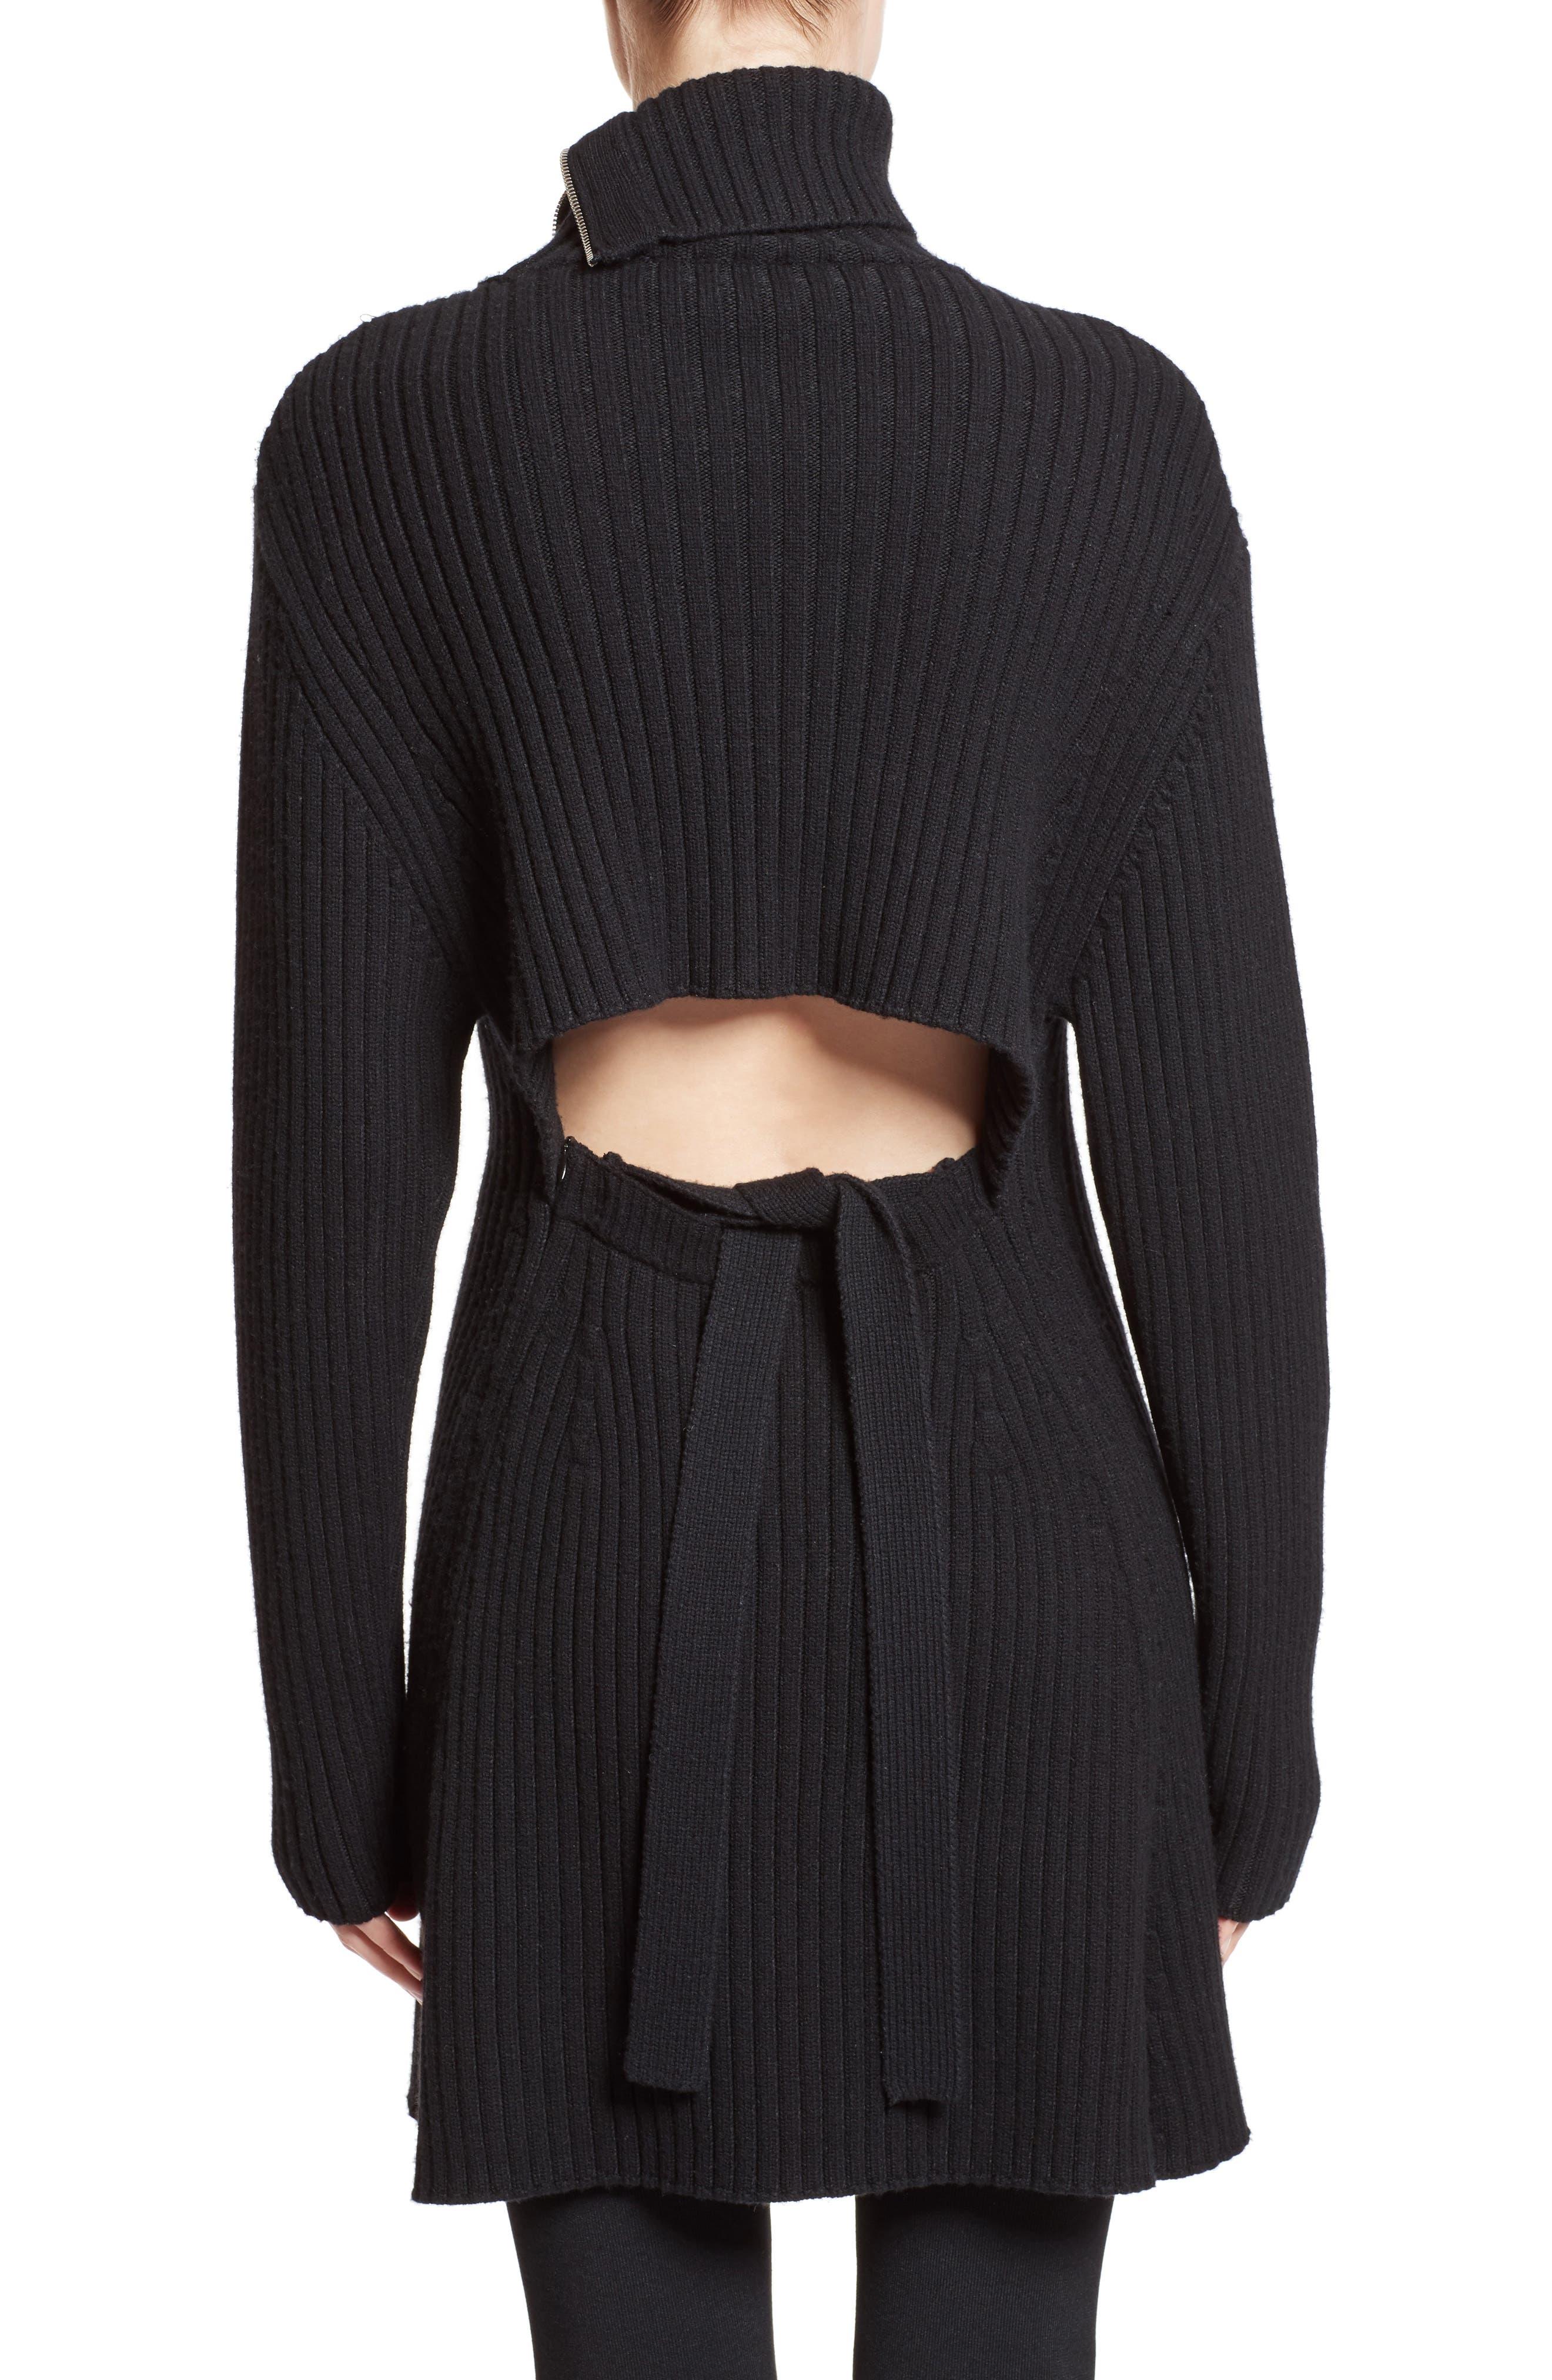 Wool & Cashmere Blend Turtleneck Dress,                             Alternate thumbnail 2, color,                             Black